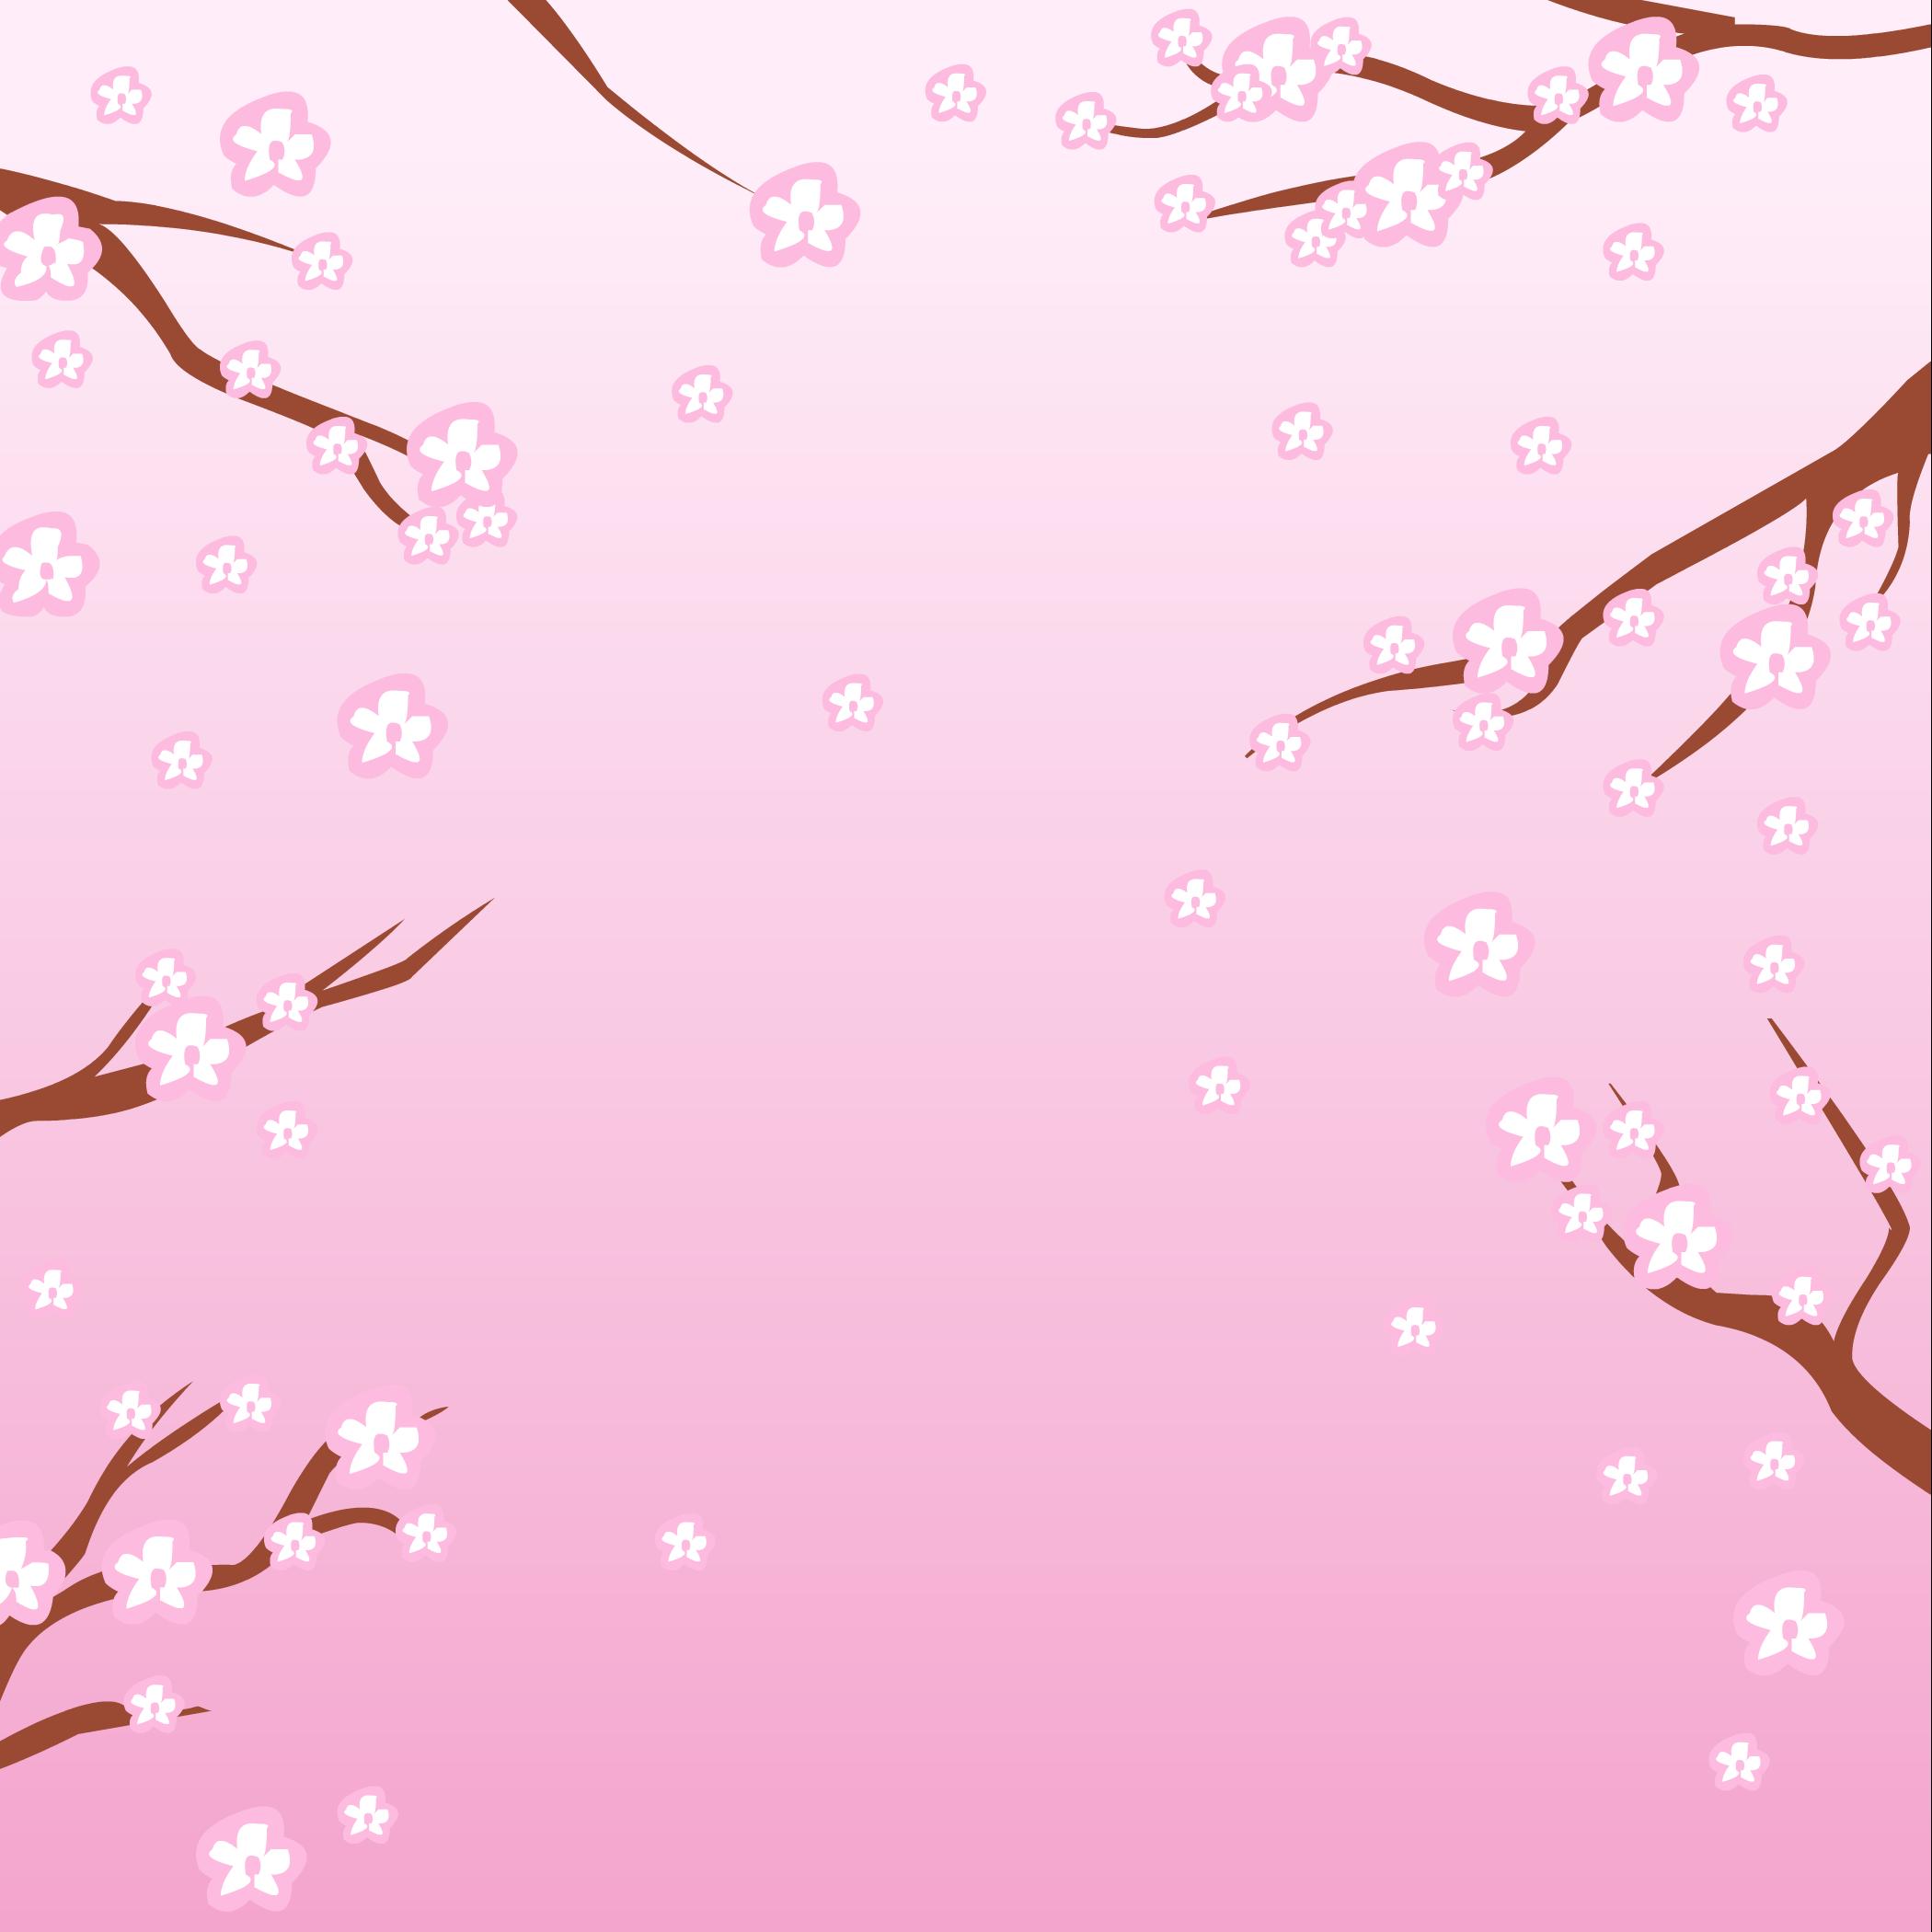 Blossom Background